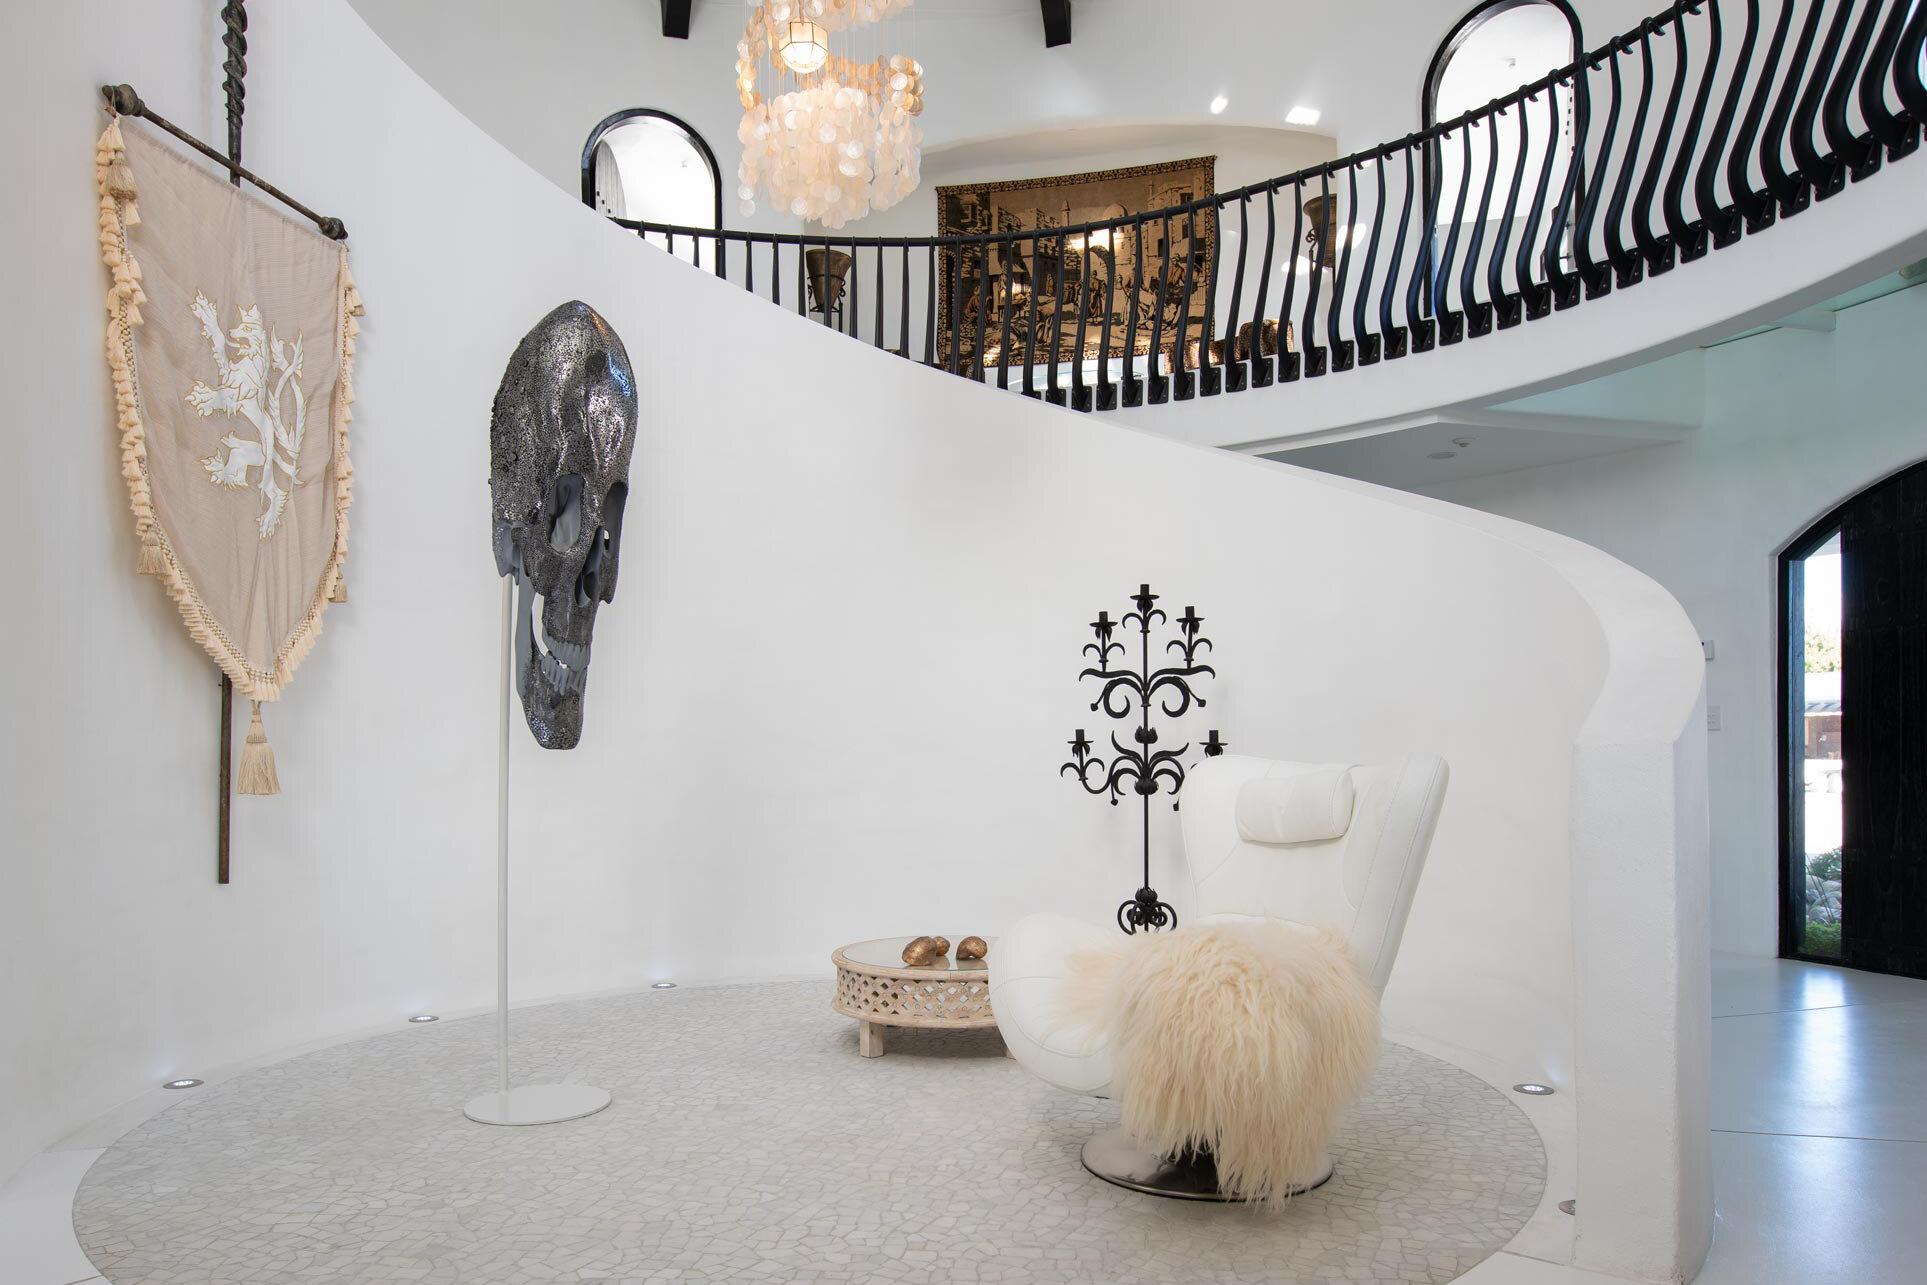 Javier-Murcia-Eidos-Collection-Location-1.jpg